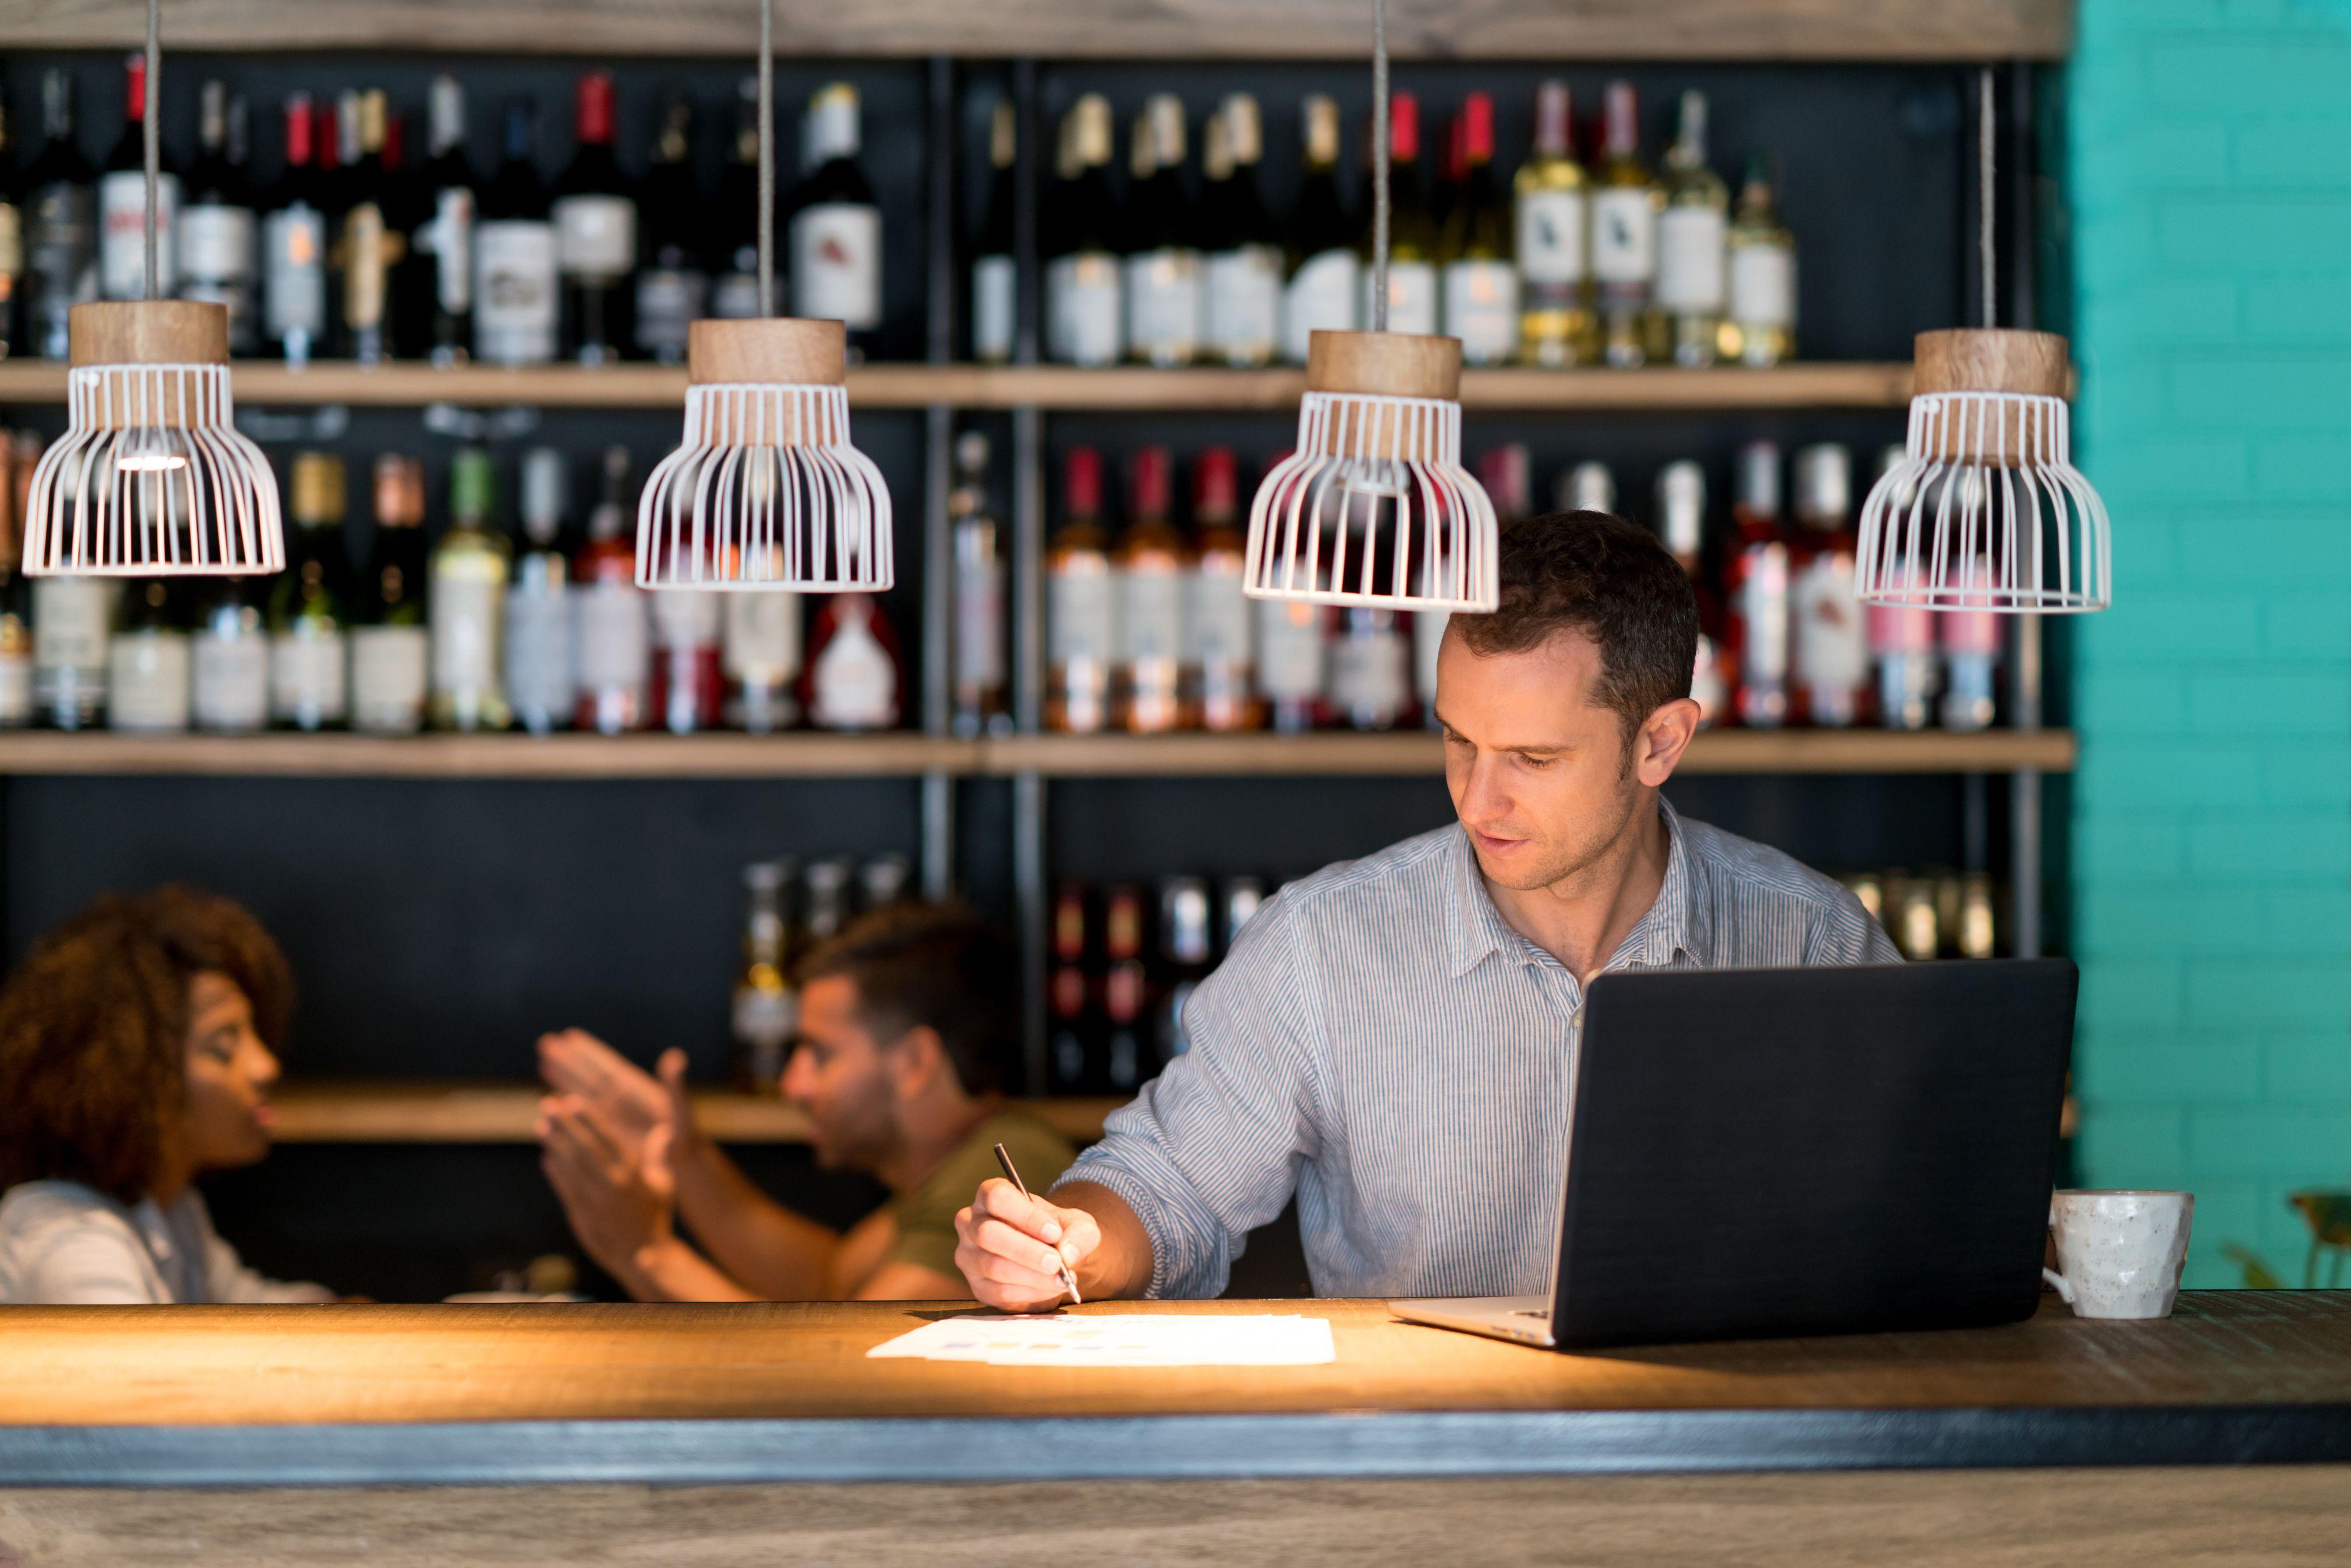 Guia completo para entender o lucro e custos do seu restaurante